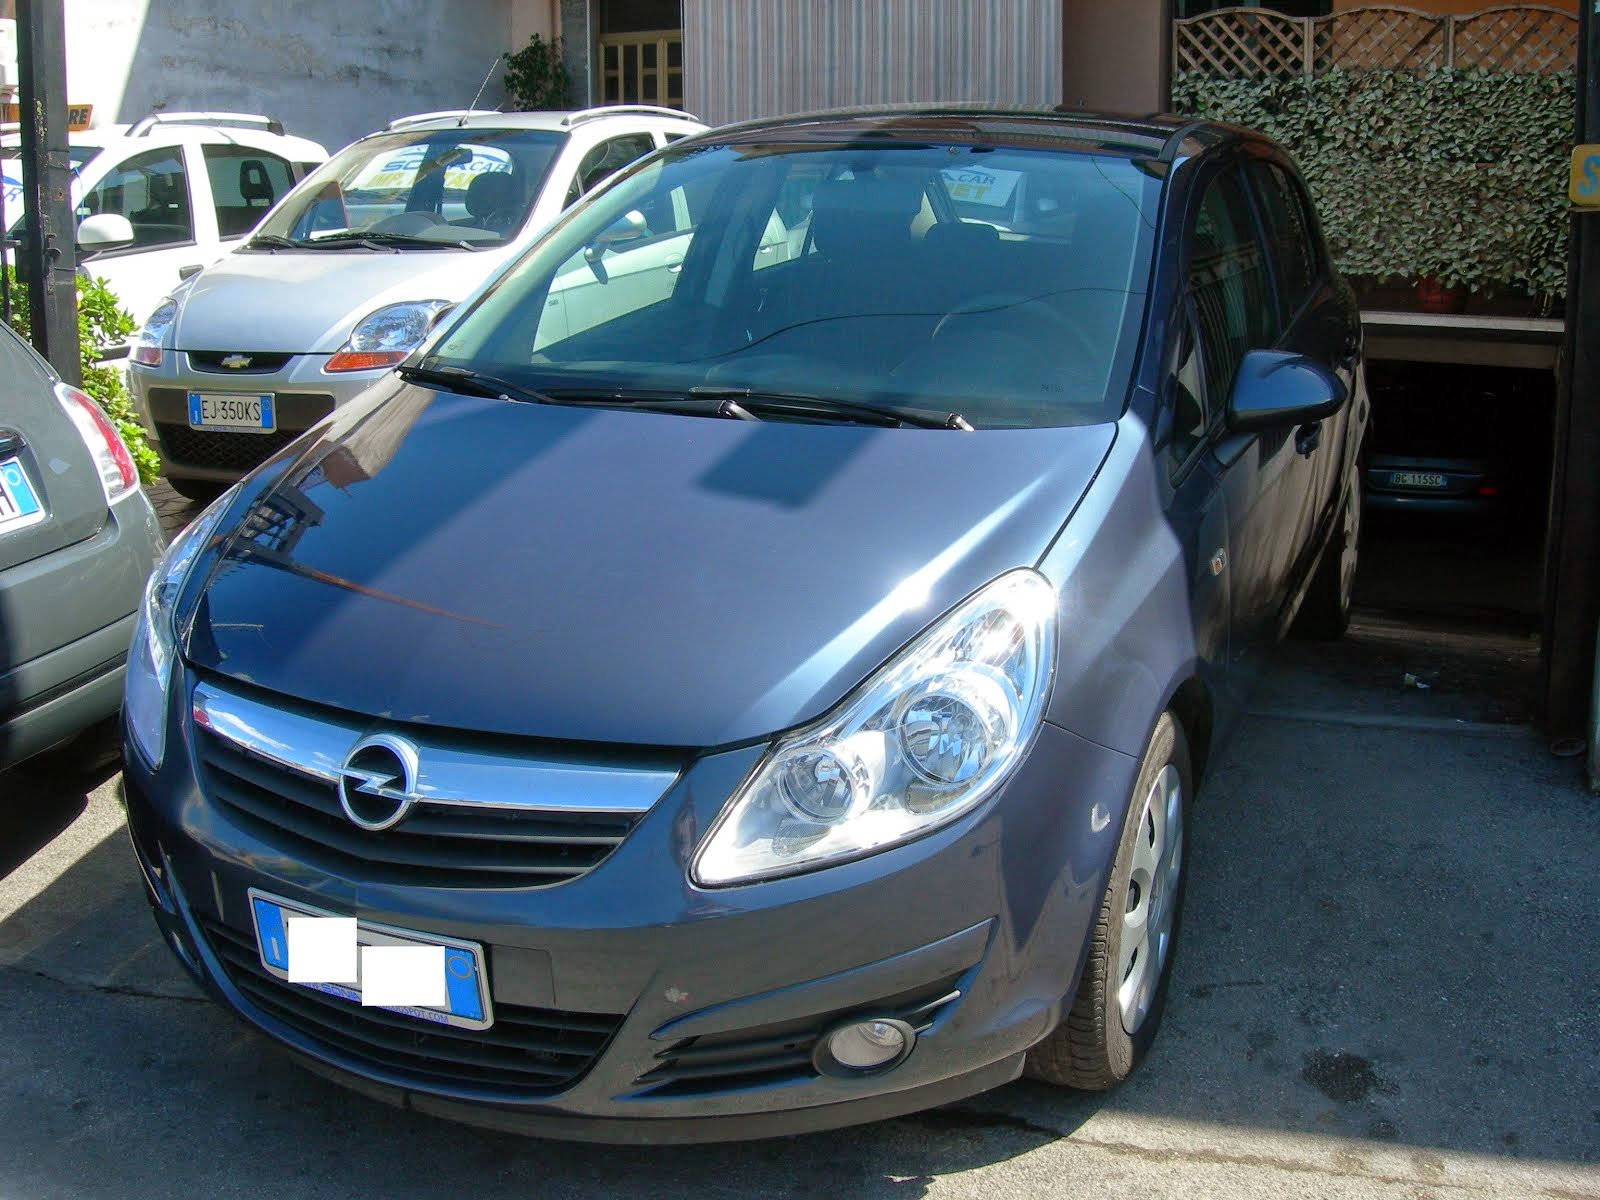 Opel Corsa 1.2 Eco Metano 2010 7.000,00 Euro